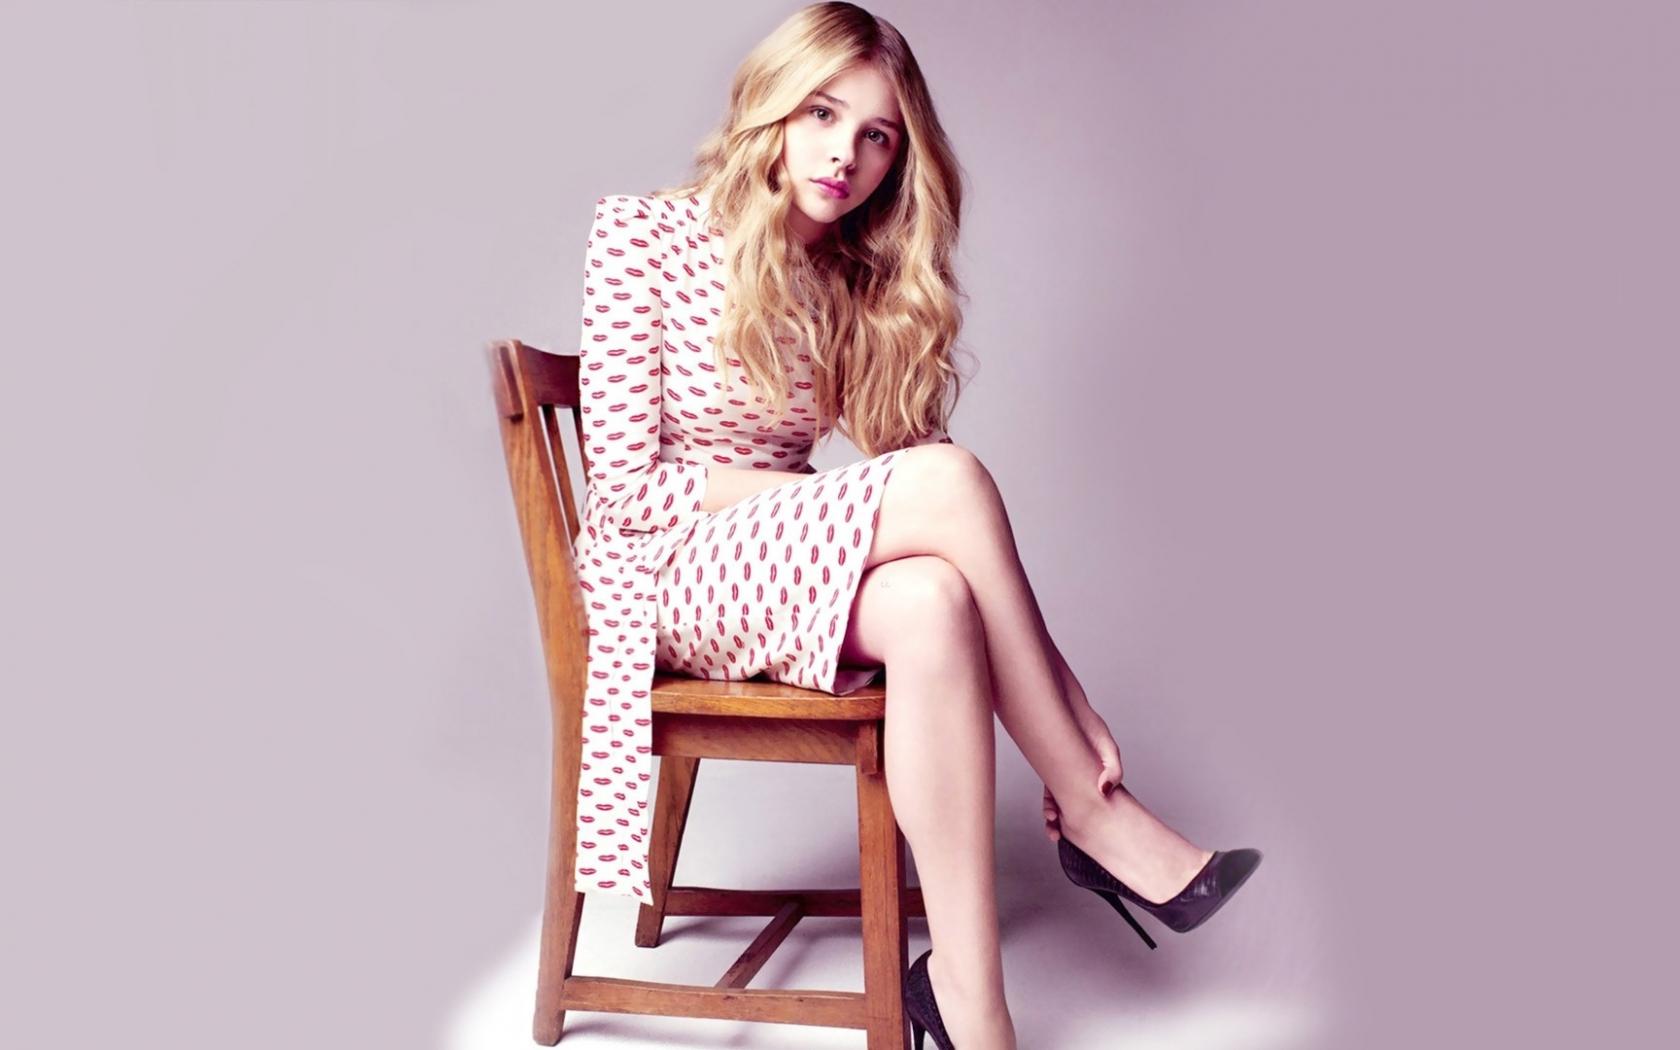 Chloe Grace Moretz, sit, celebrity, 1680x1050 wallpaper